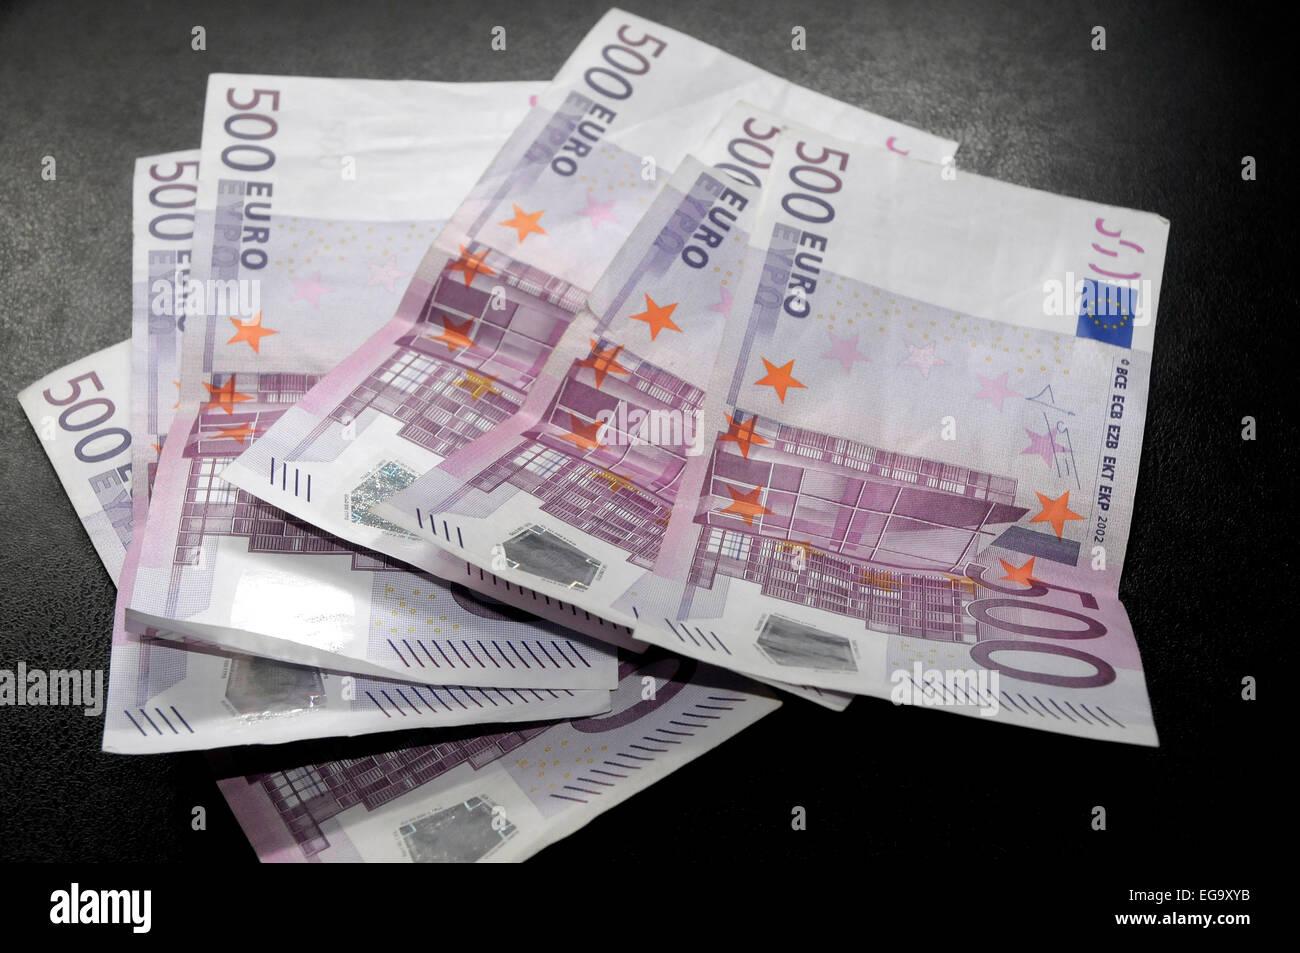 3000 euros with 500 euros six times money EEC, CEE, € - Stock Image